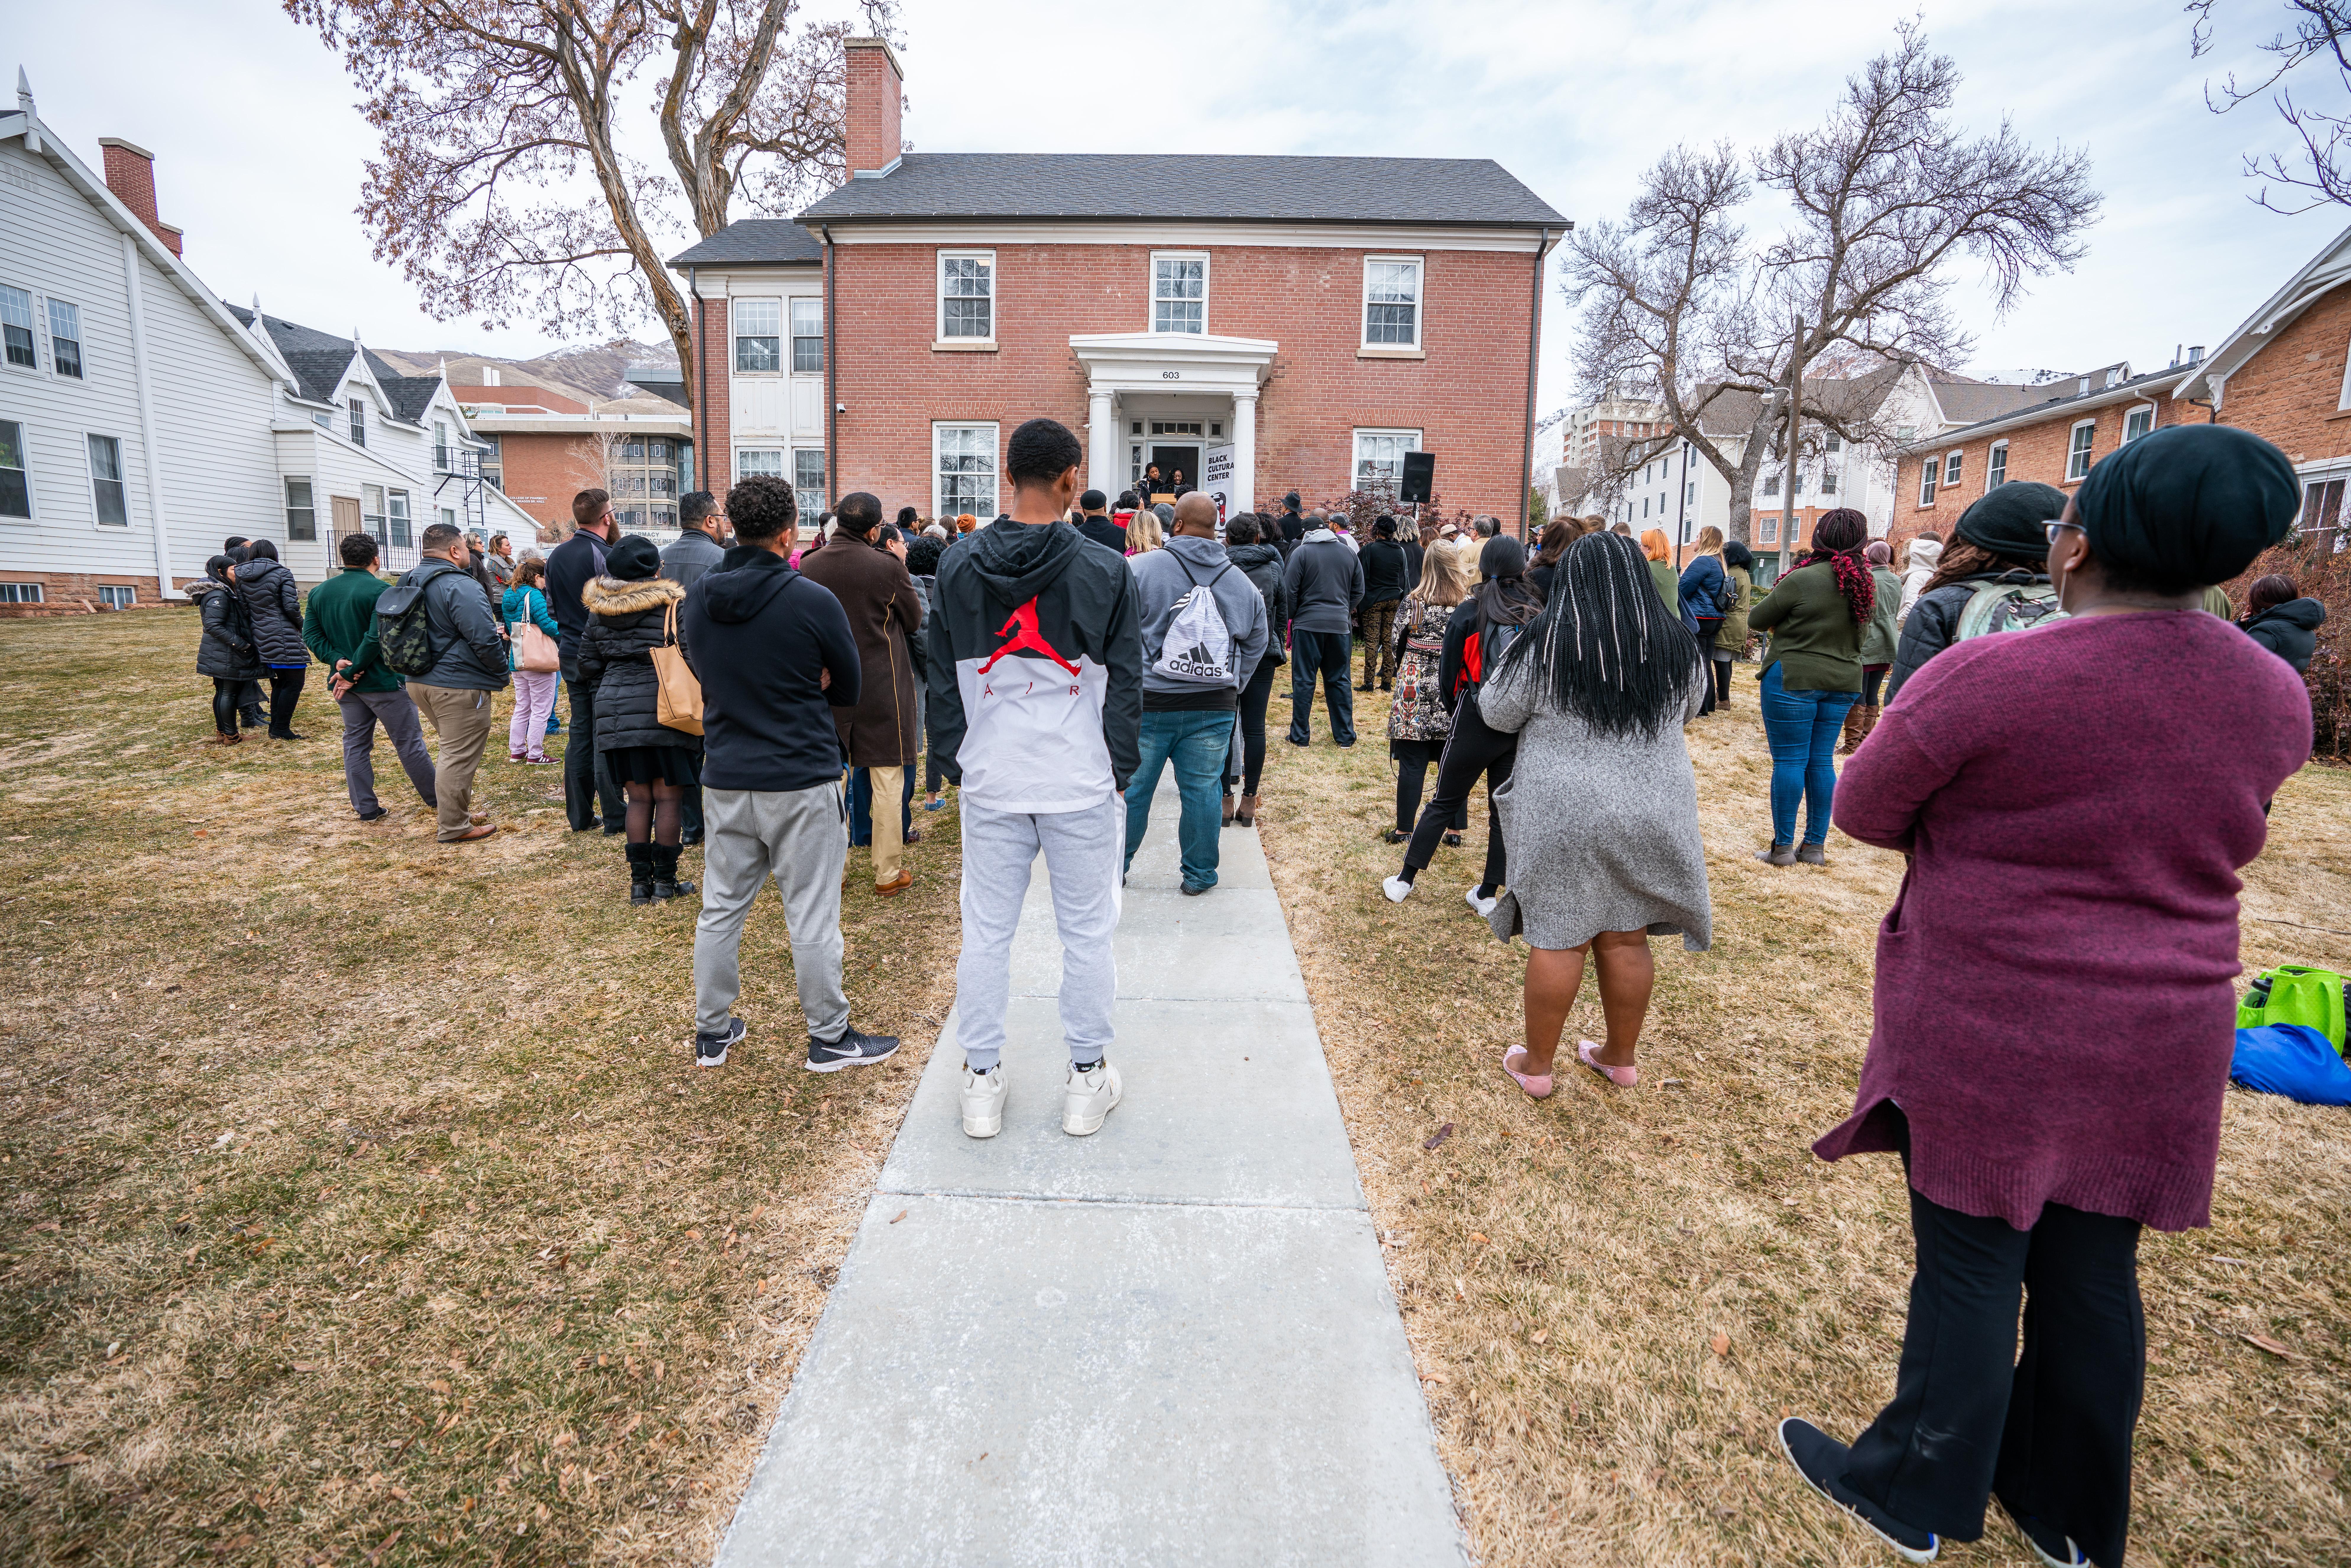 Barbara Kufiadan, Black Student Union Member speaks at the Black Cultural Center in Salt Lake City, Utah University of Utah, 95 Fort Douglas Blvd. (Bldg. 603)